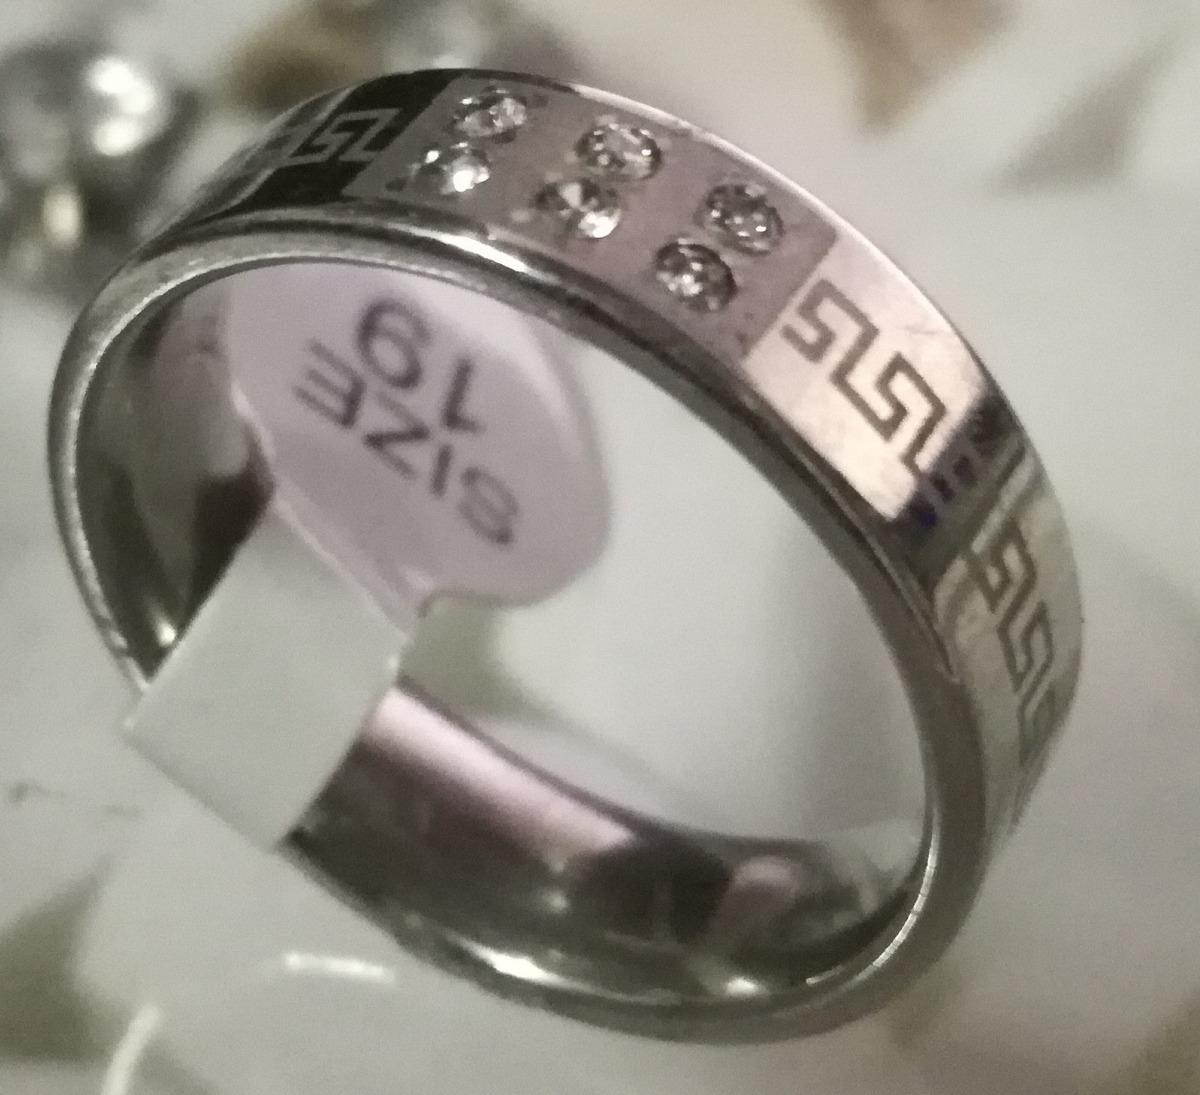 2d0f557e7c2a anillo acero quirúrgico 316l piedras centrales y guarda t19. Cargando zoom.